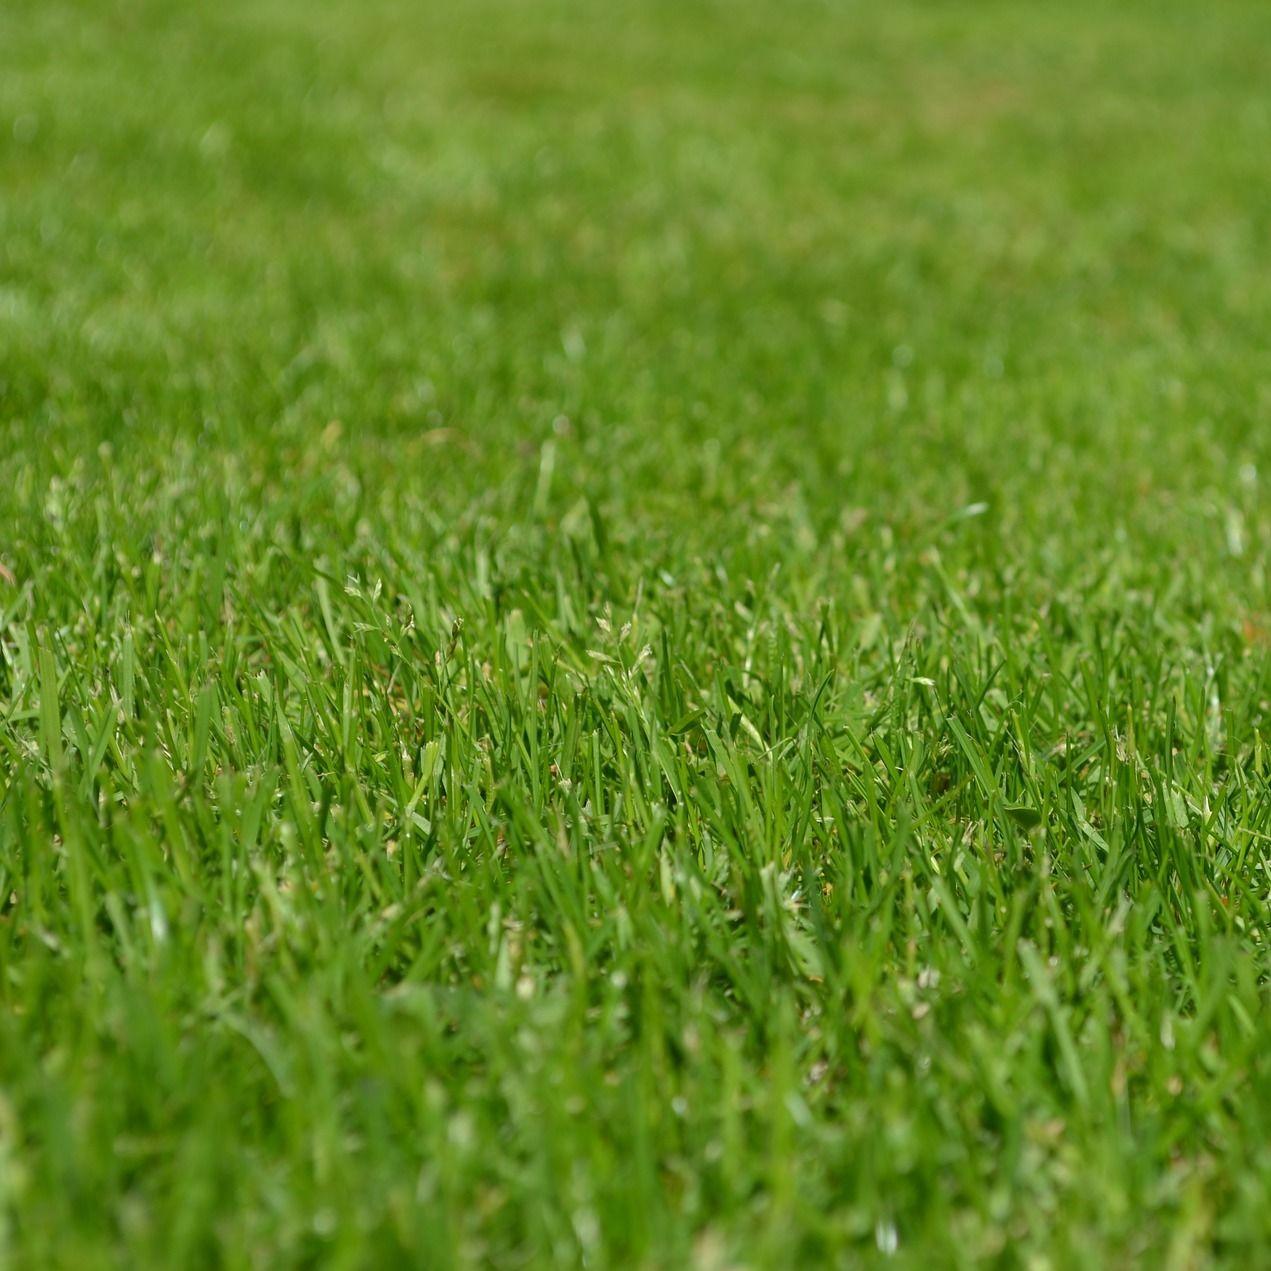 Grass nbwtb1